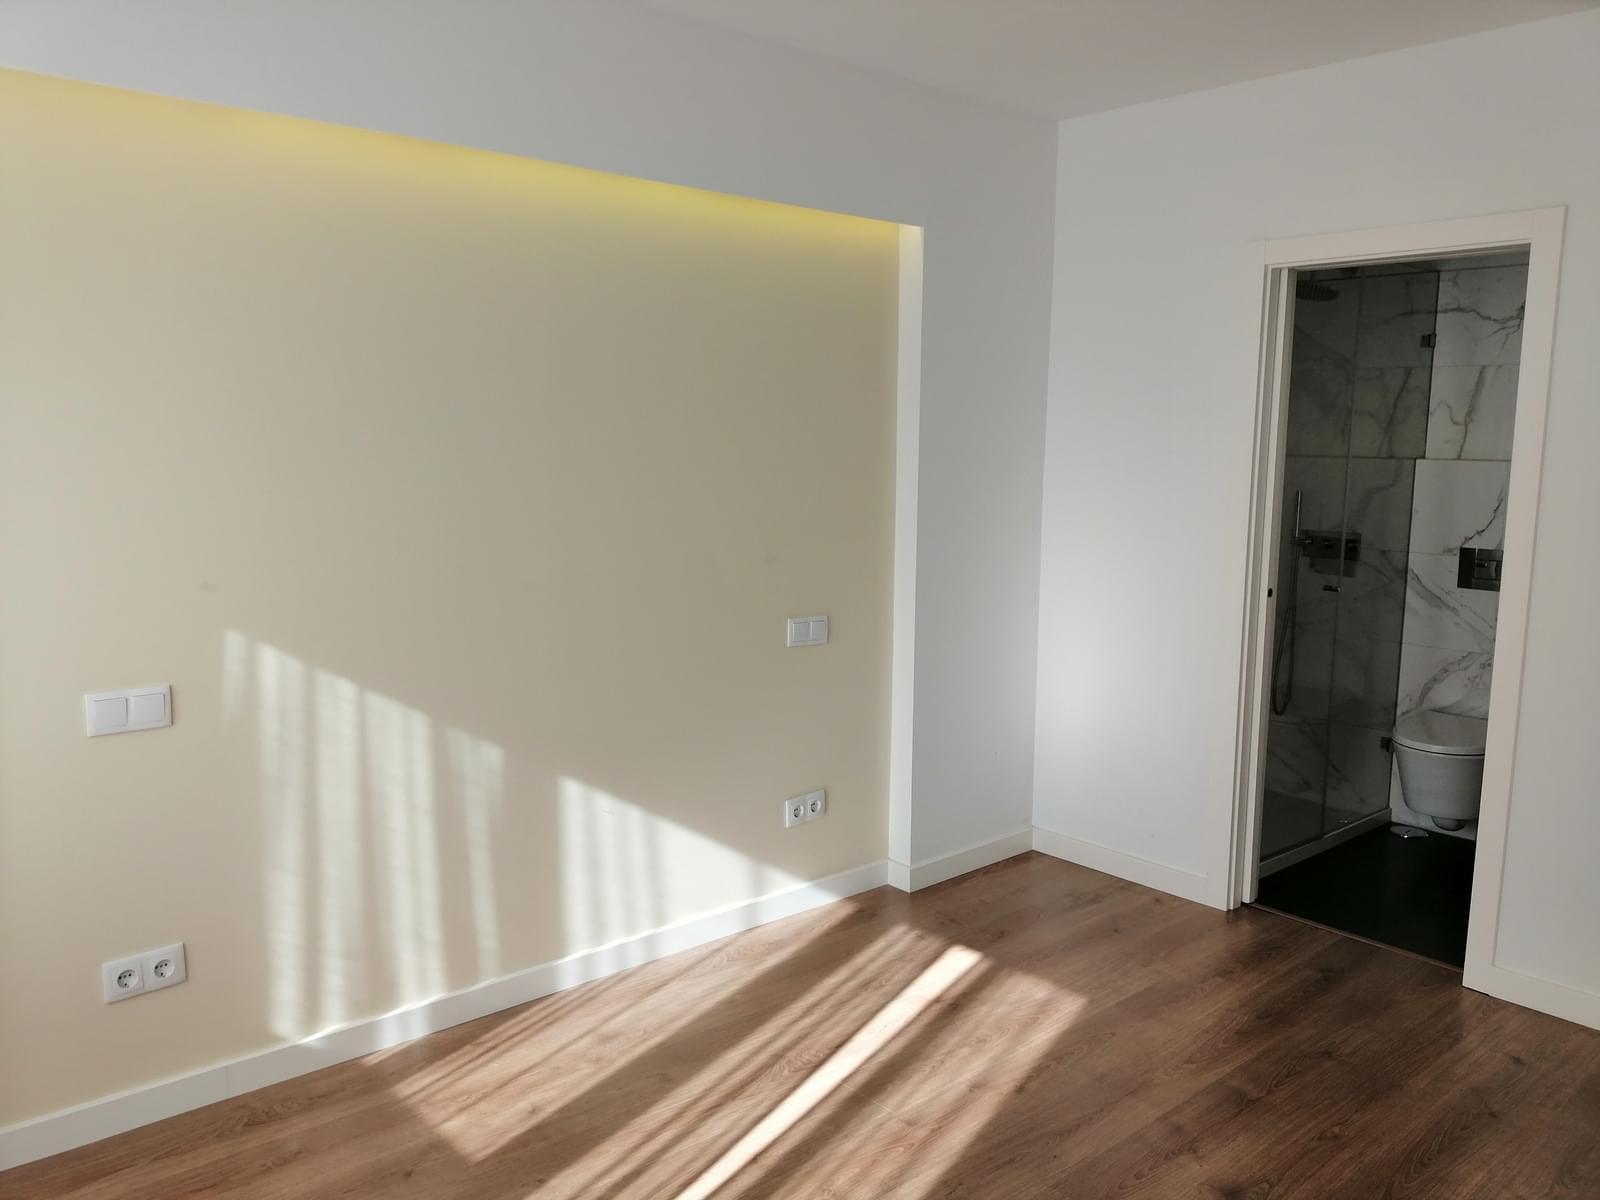 pf18996-apartamento-t3-lisboa-39c86cc4-11a0-4096-9aaf-07e254643989